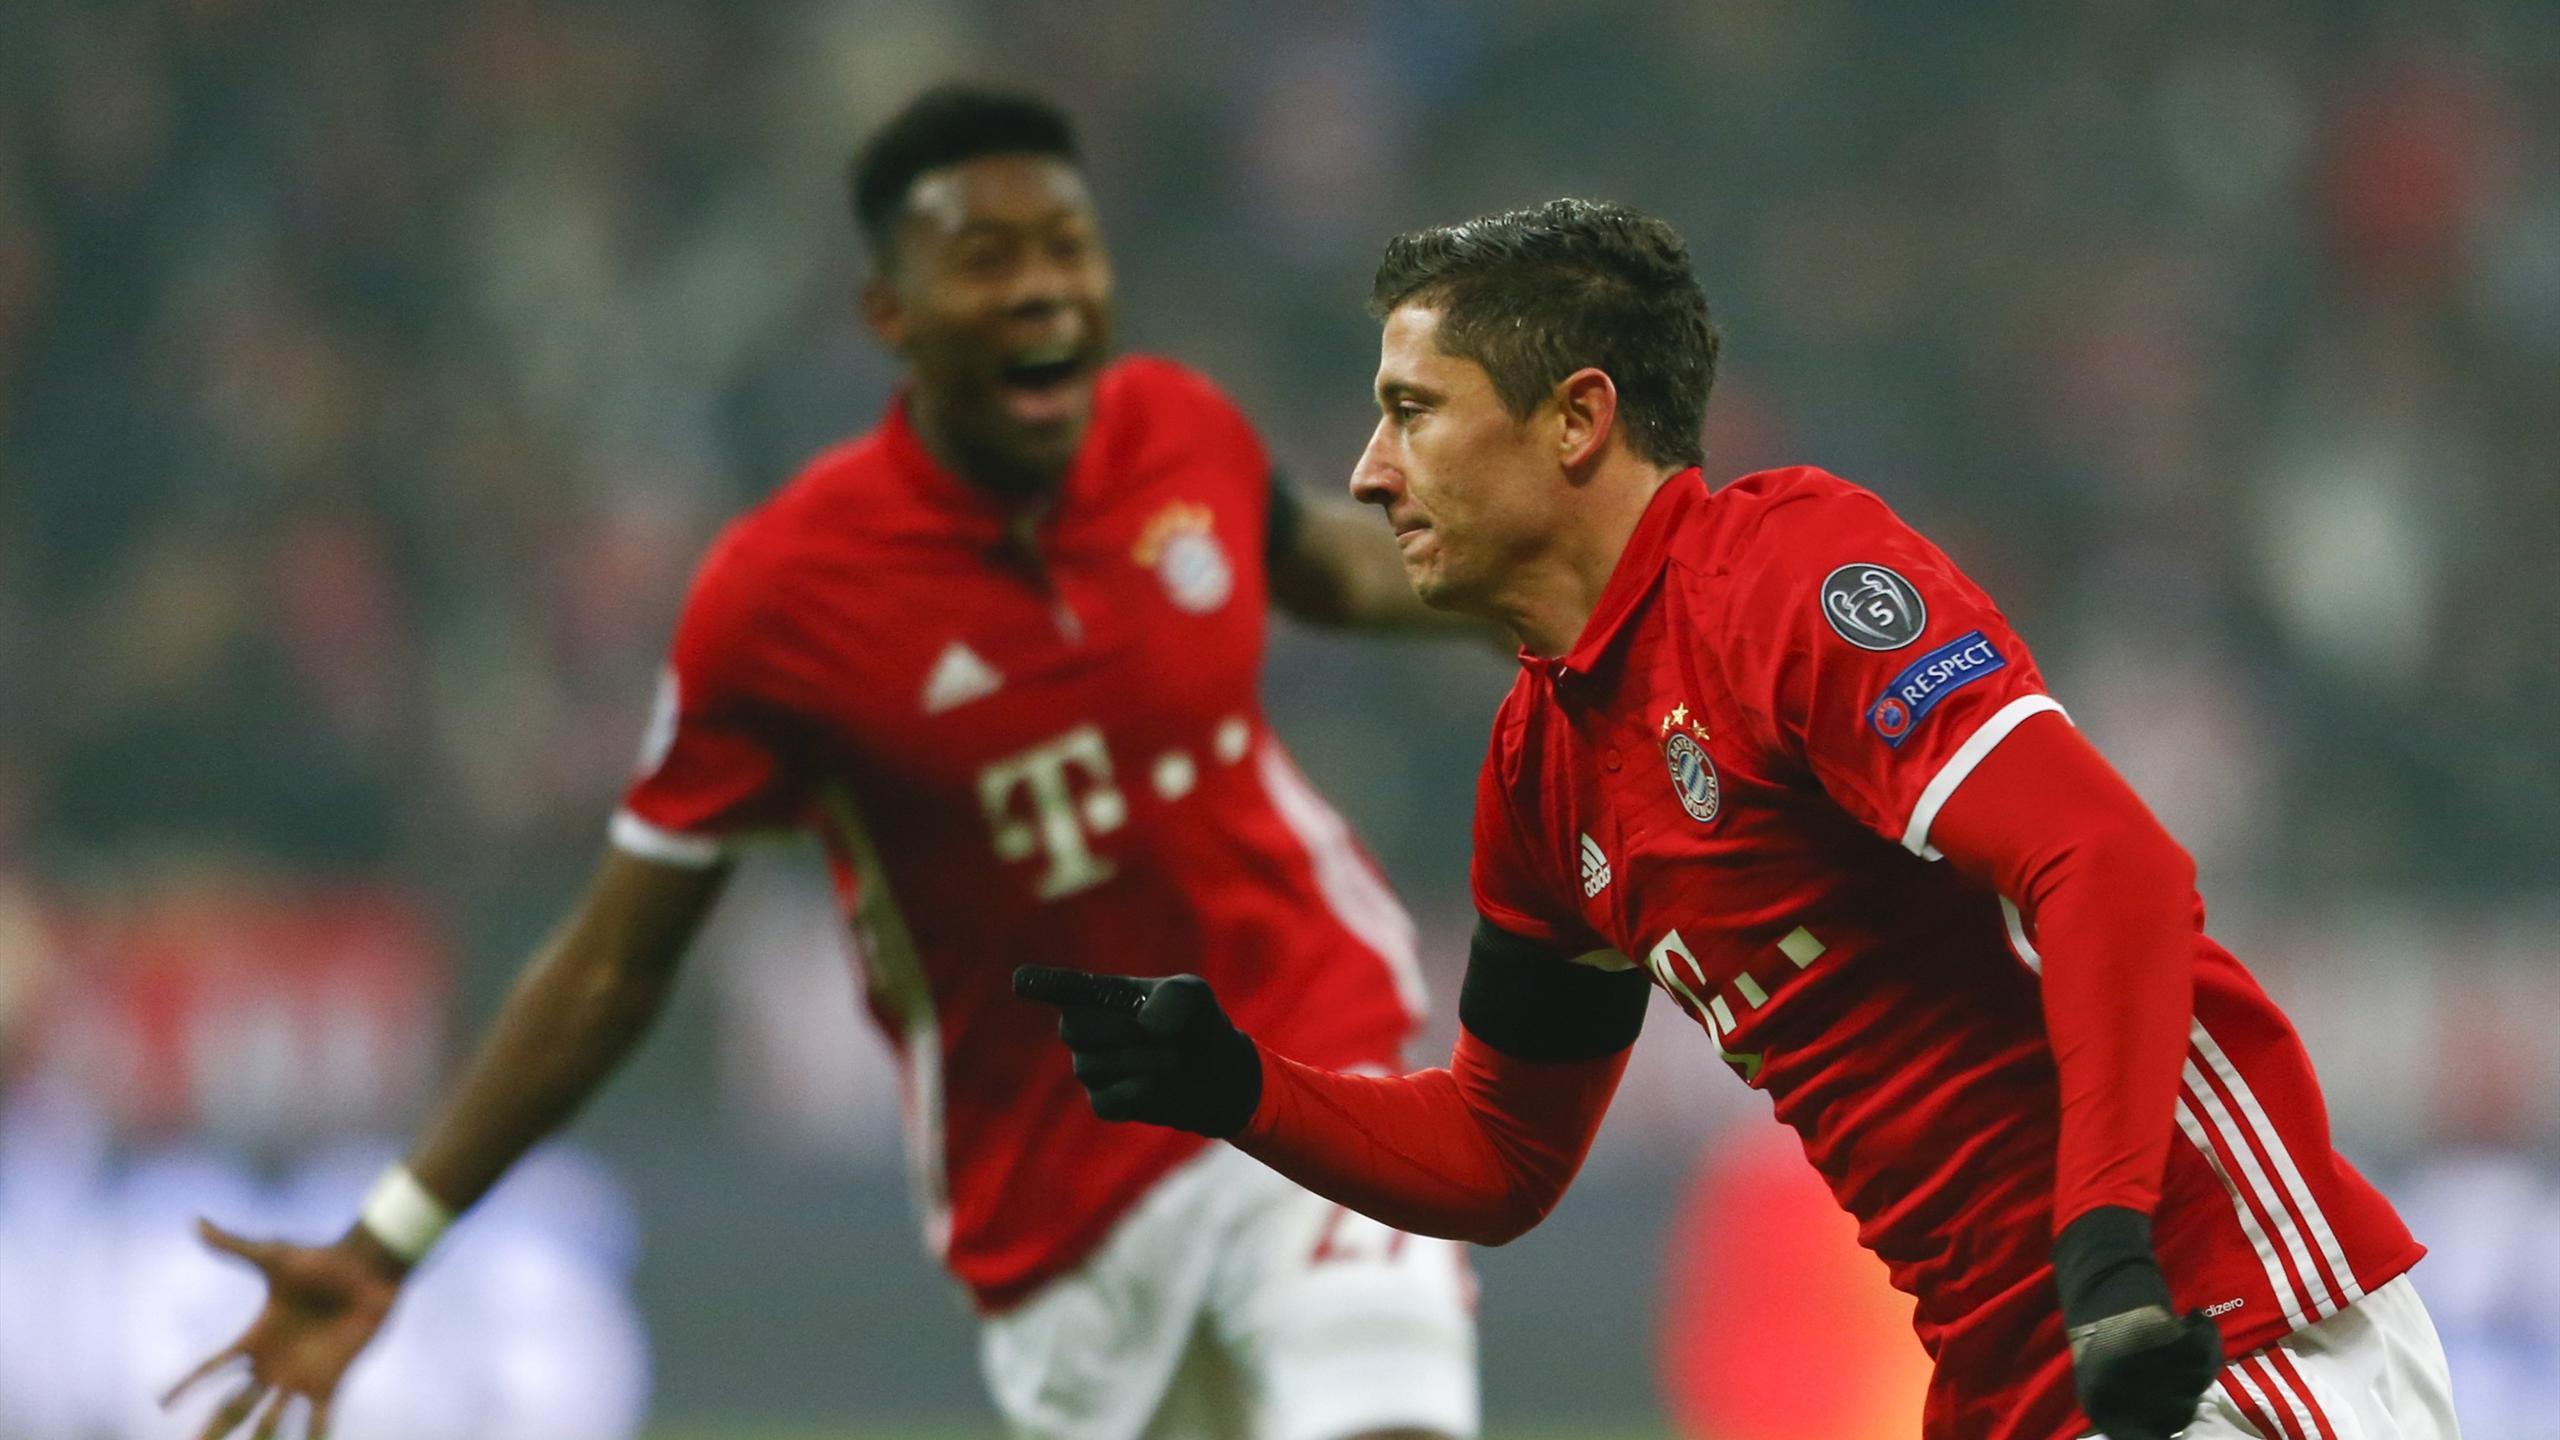 Bayern Munich's Robert Lewandowski reacts after scoring against Atletico Madrid